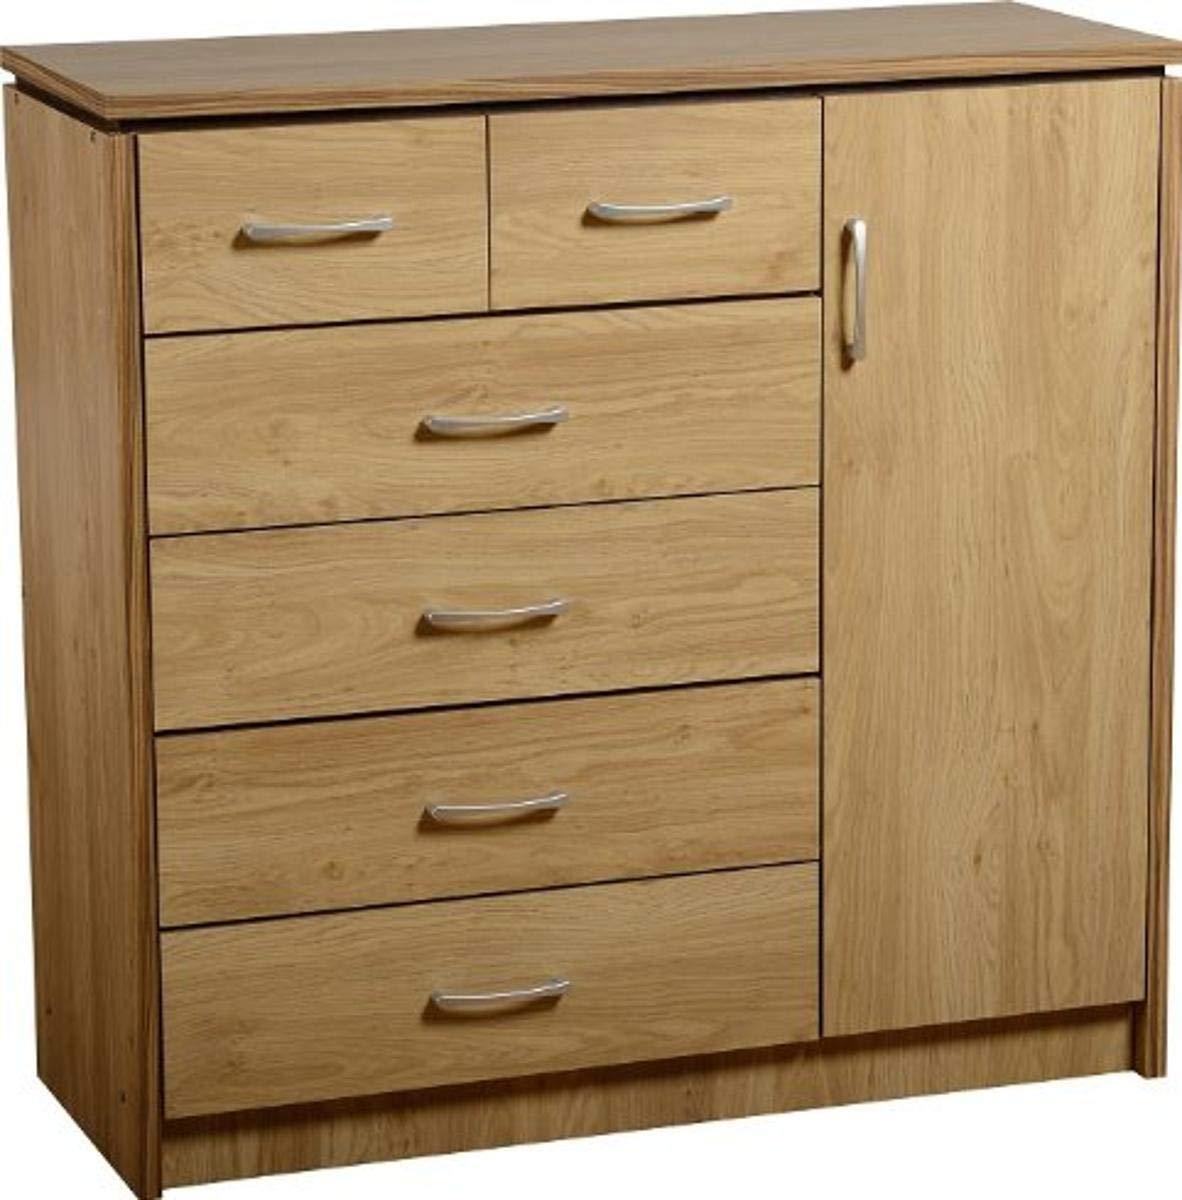 Seconique Charles 1 Door 6 Drawer Chest, Oak Effect with Walnut Trim, 524.95x1229.95x174.95 cm